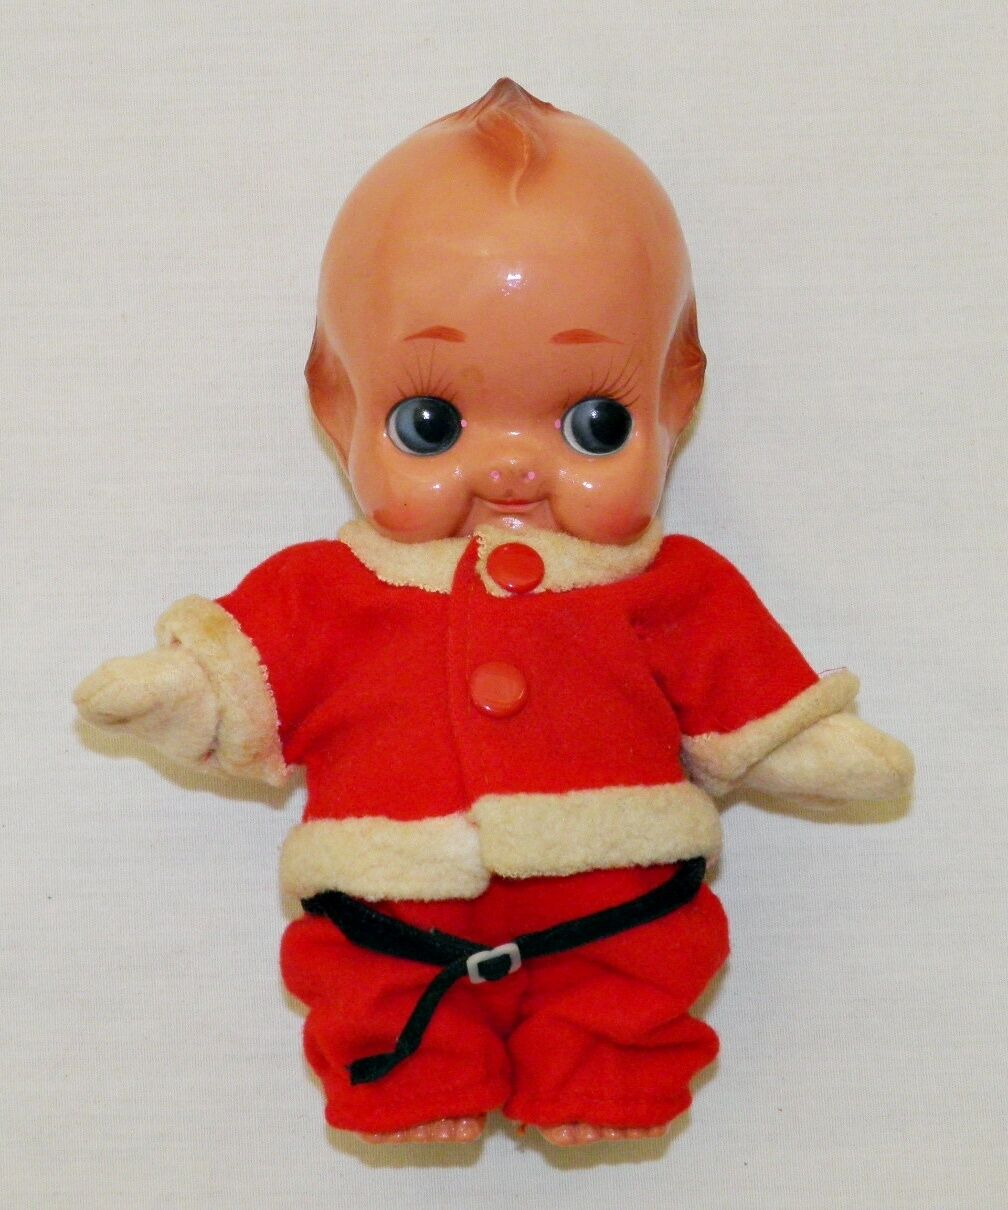 Rara Muñeca De Santa Navidad Kewpie Encordada brazos Celuloide Vintage Japón